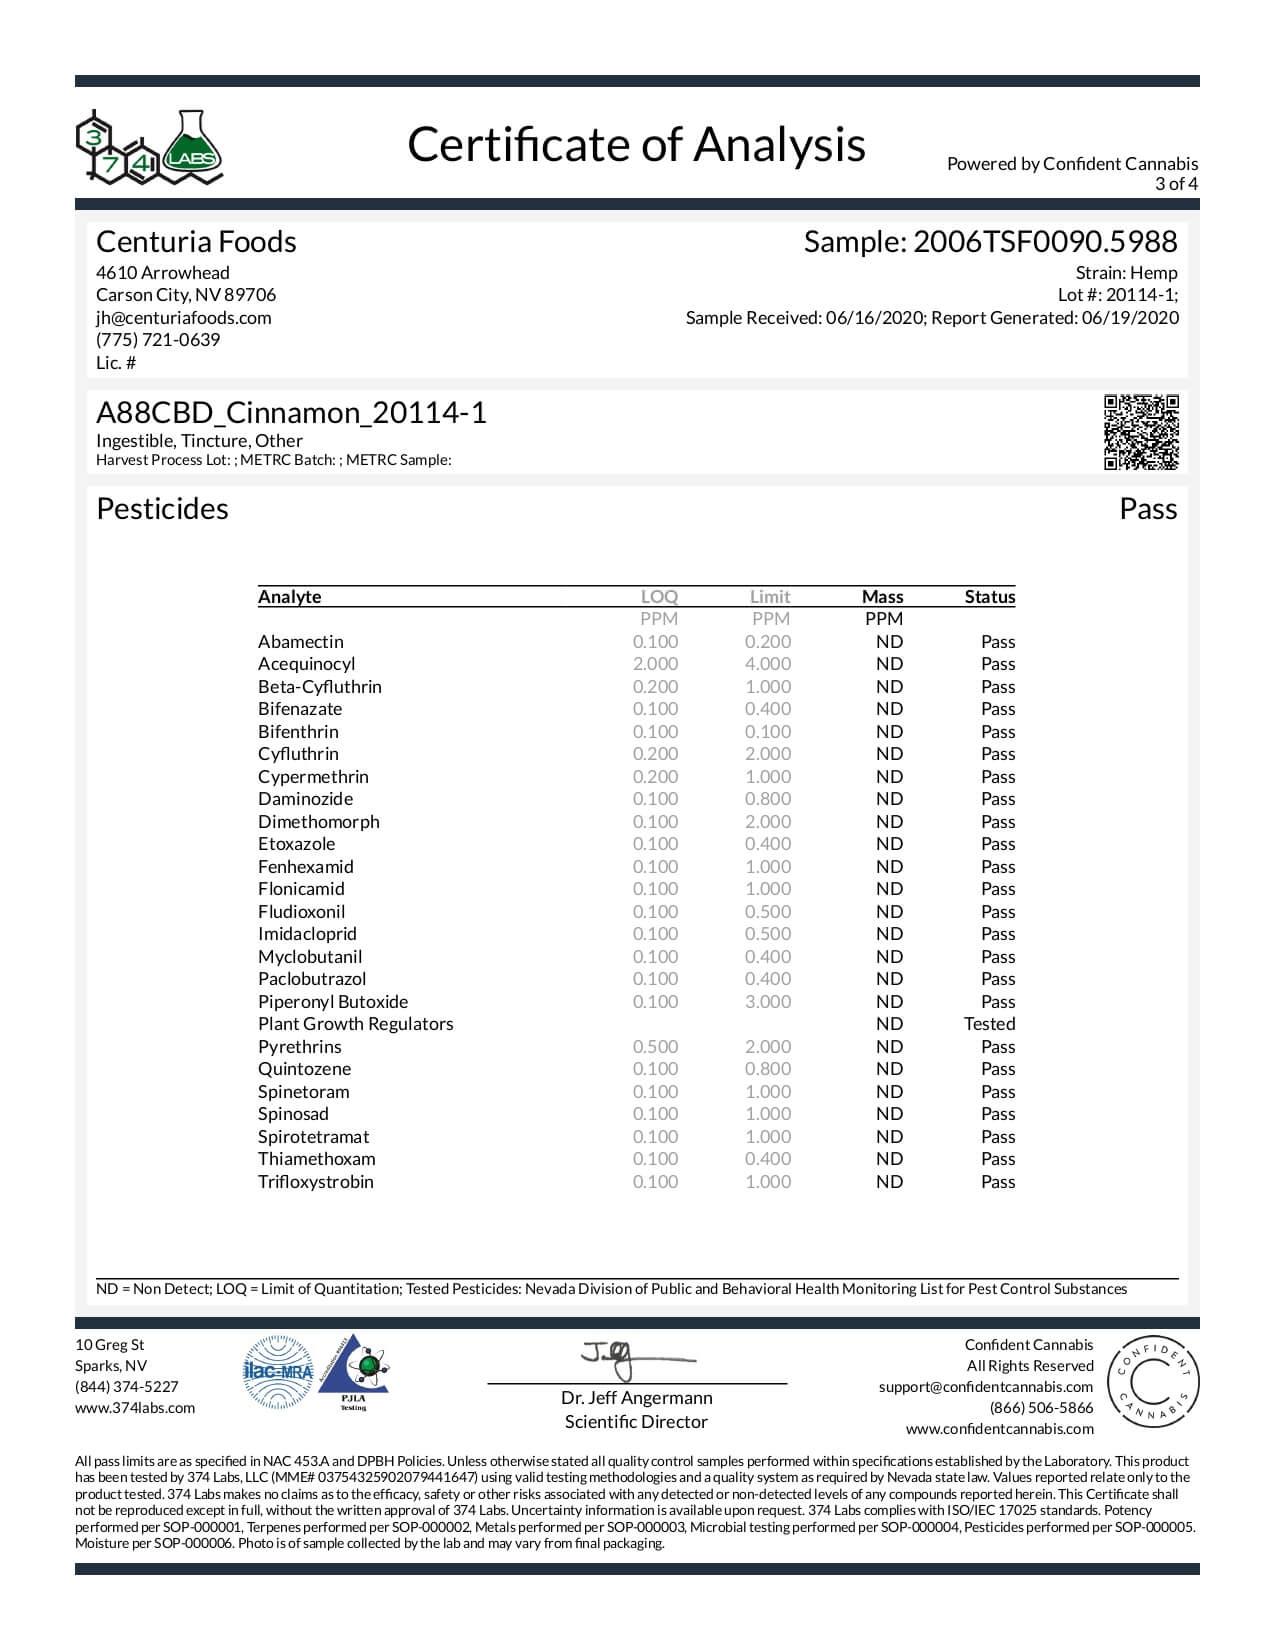 A88 CBD Tincture Broad Spectrum Cinnamon Lab Report